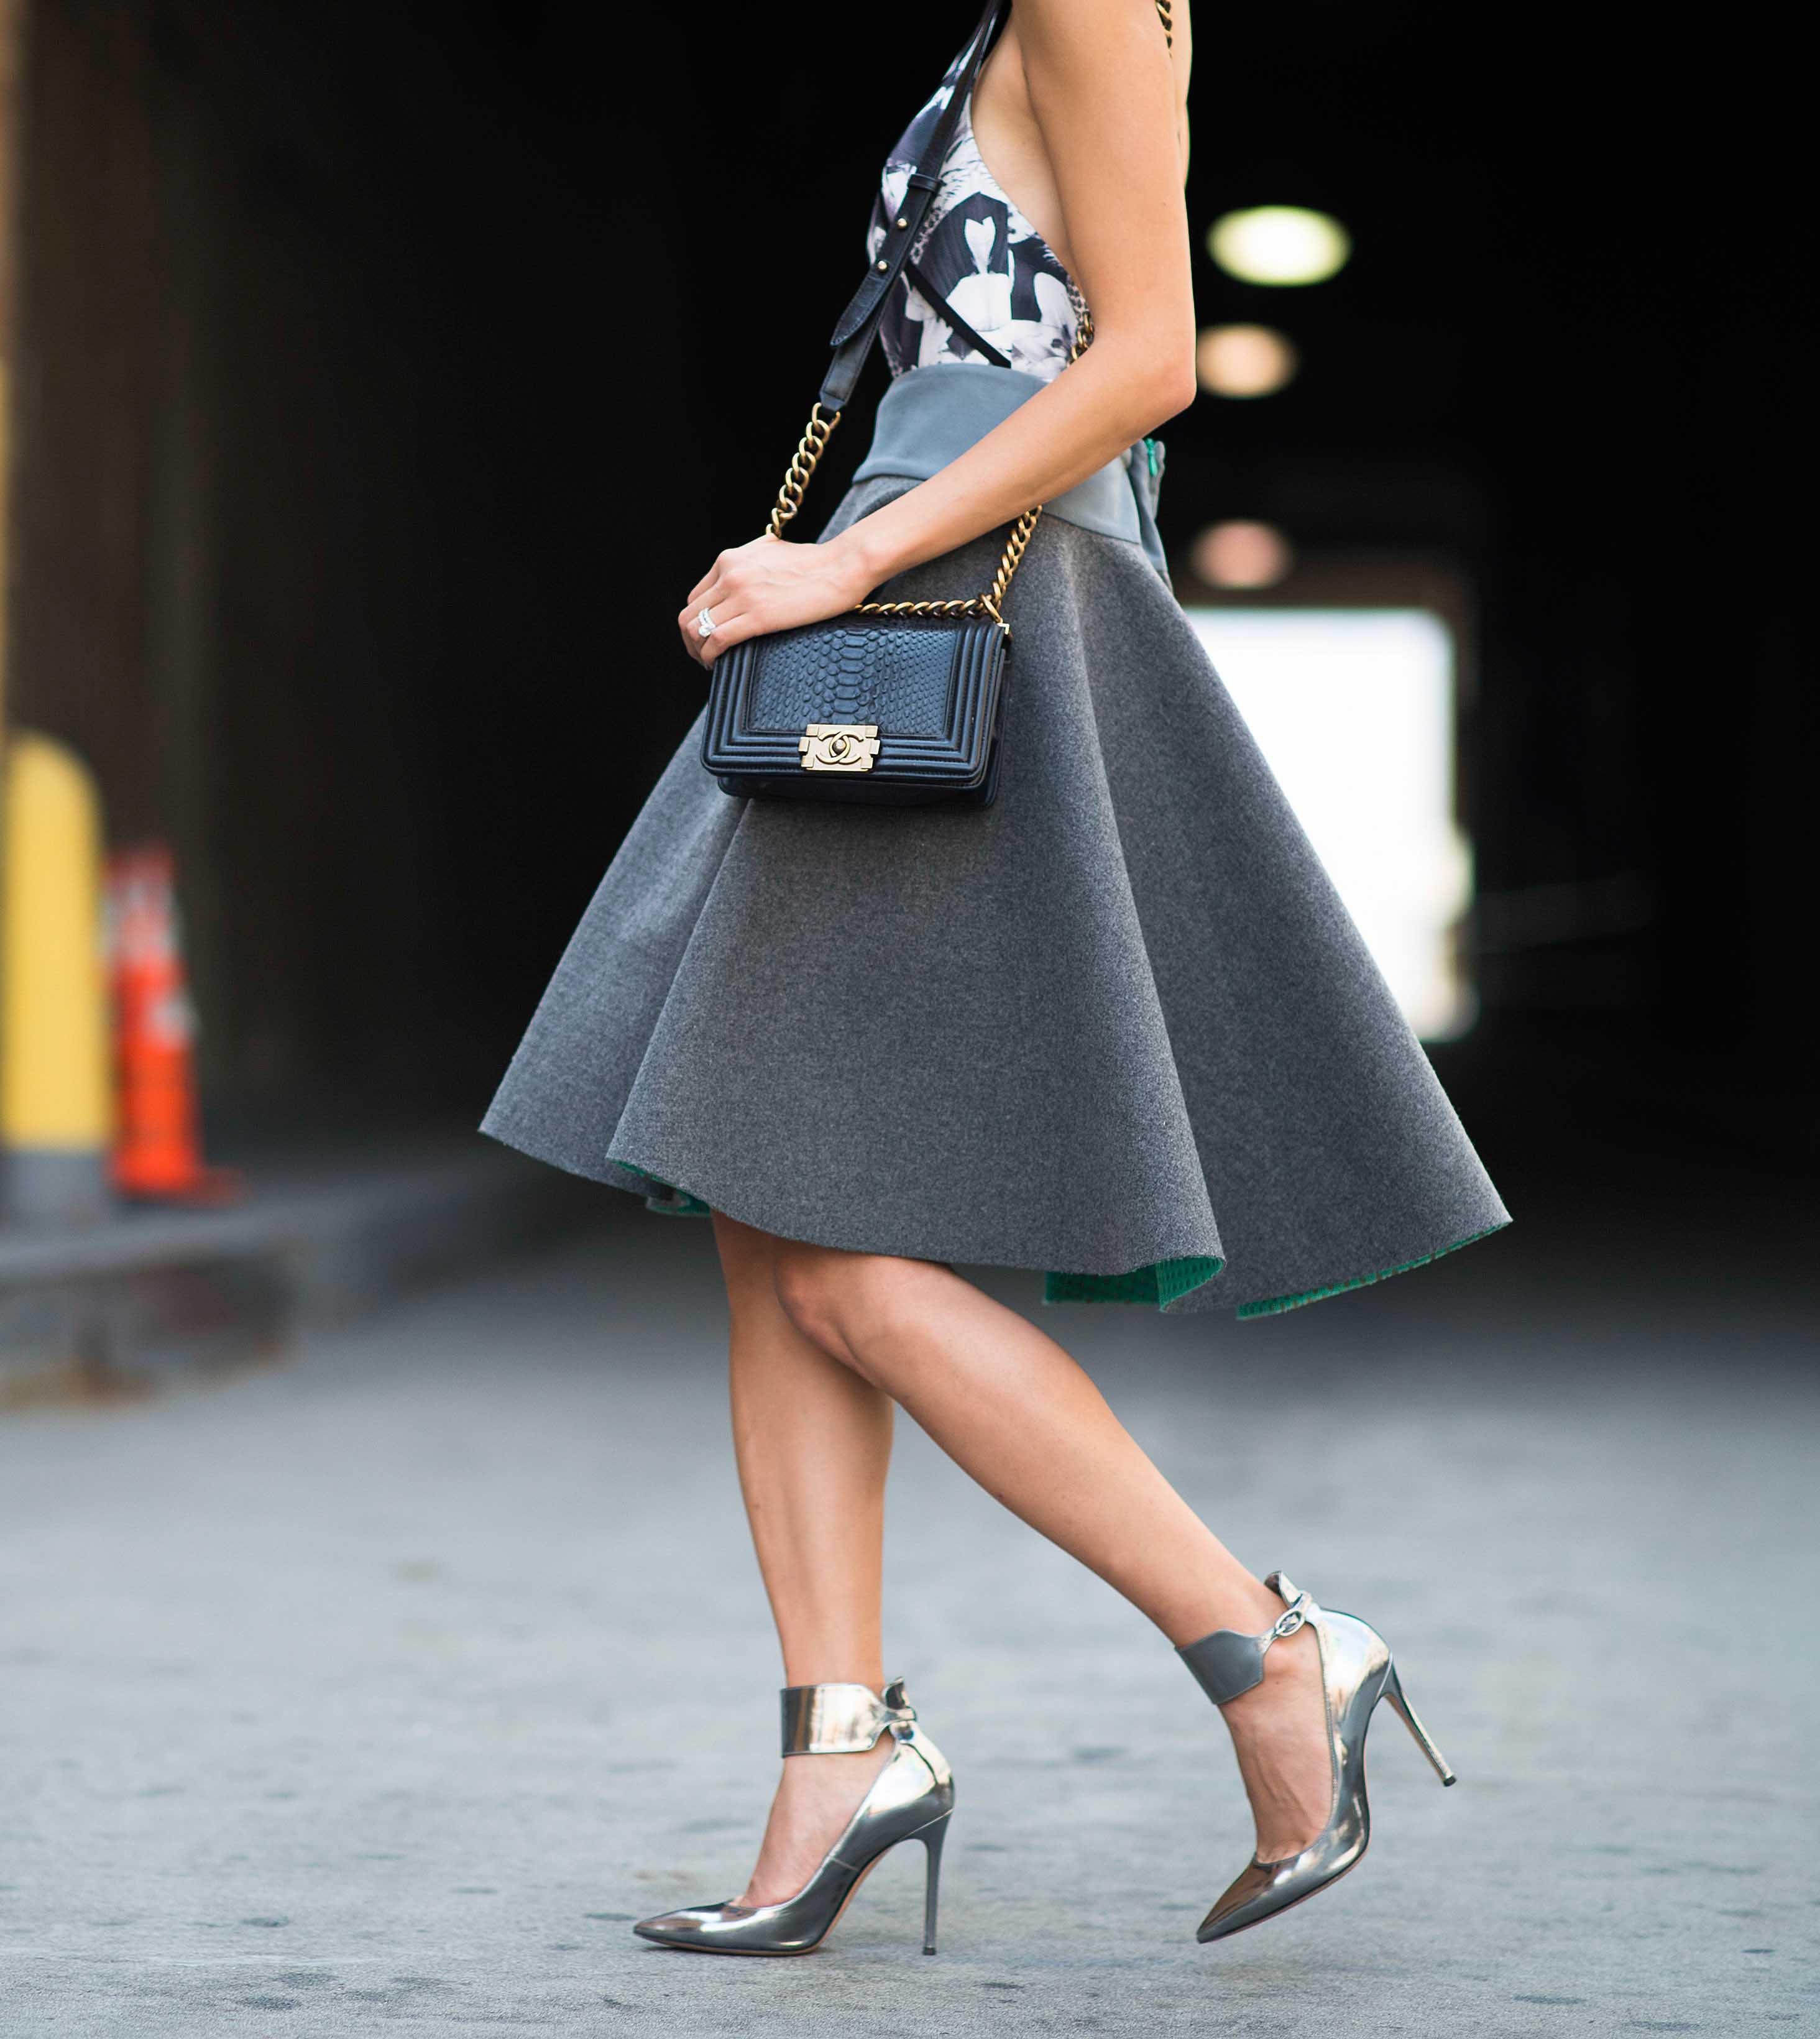 brand street style skirt colour grey